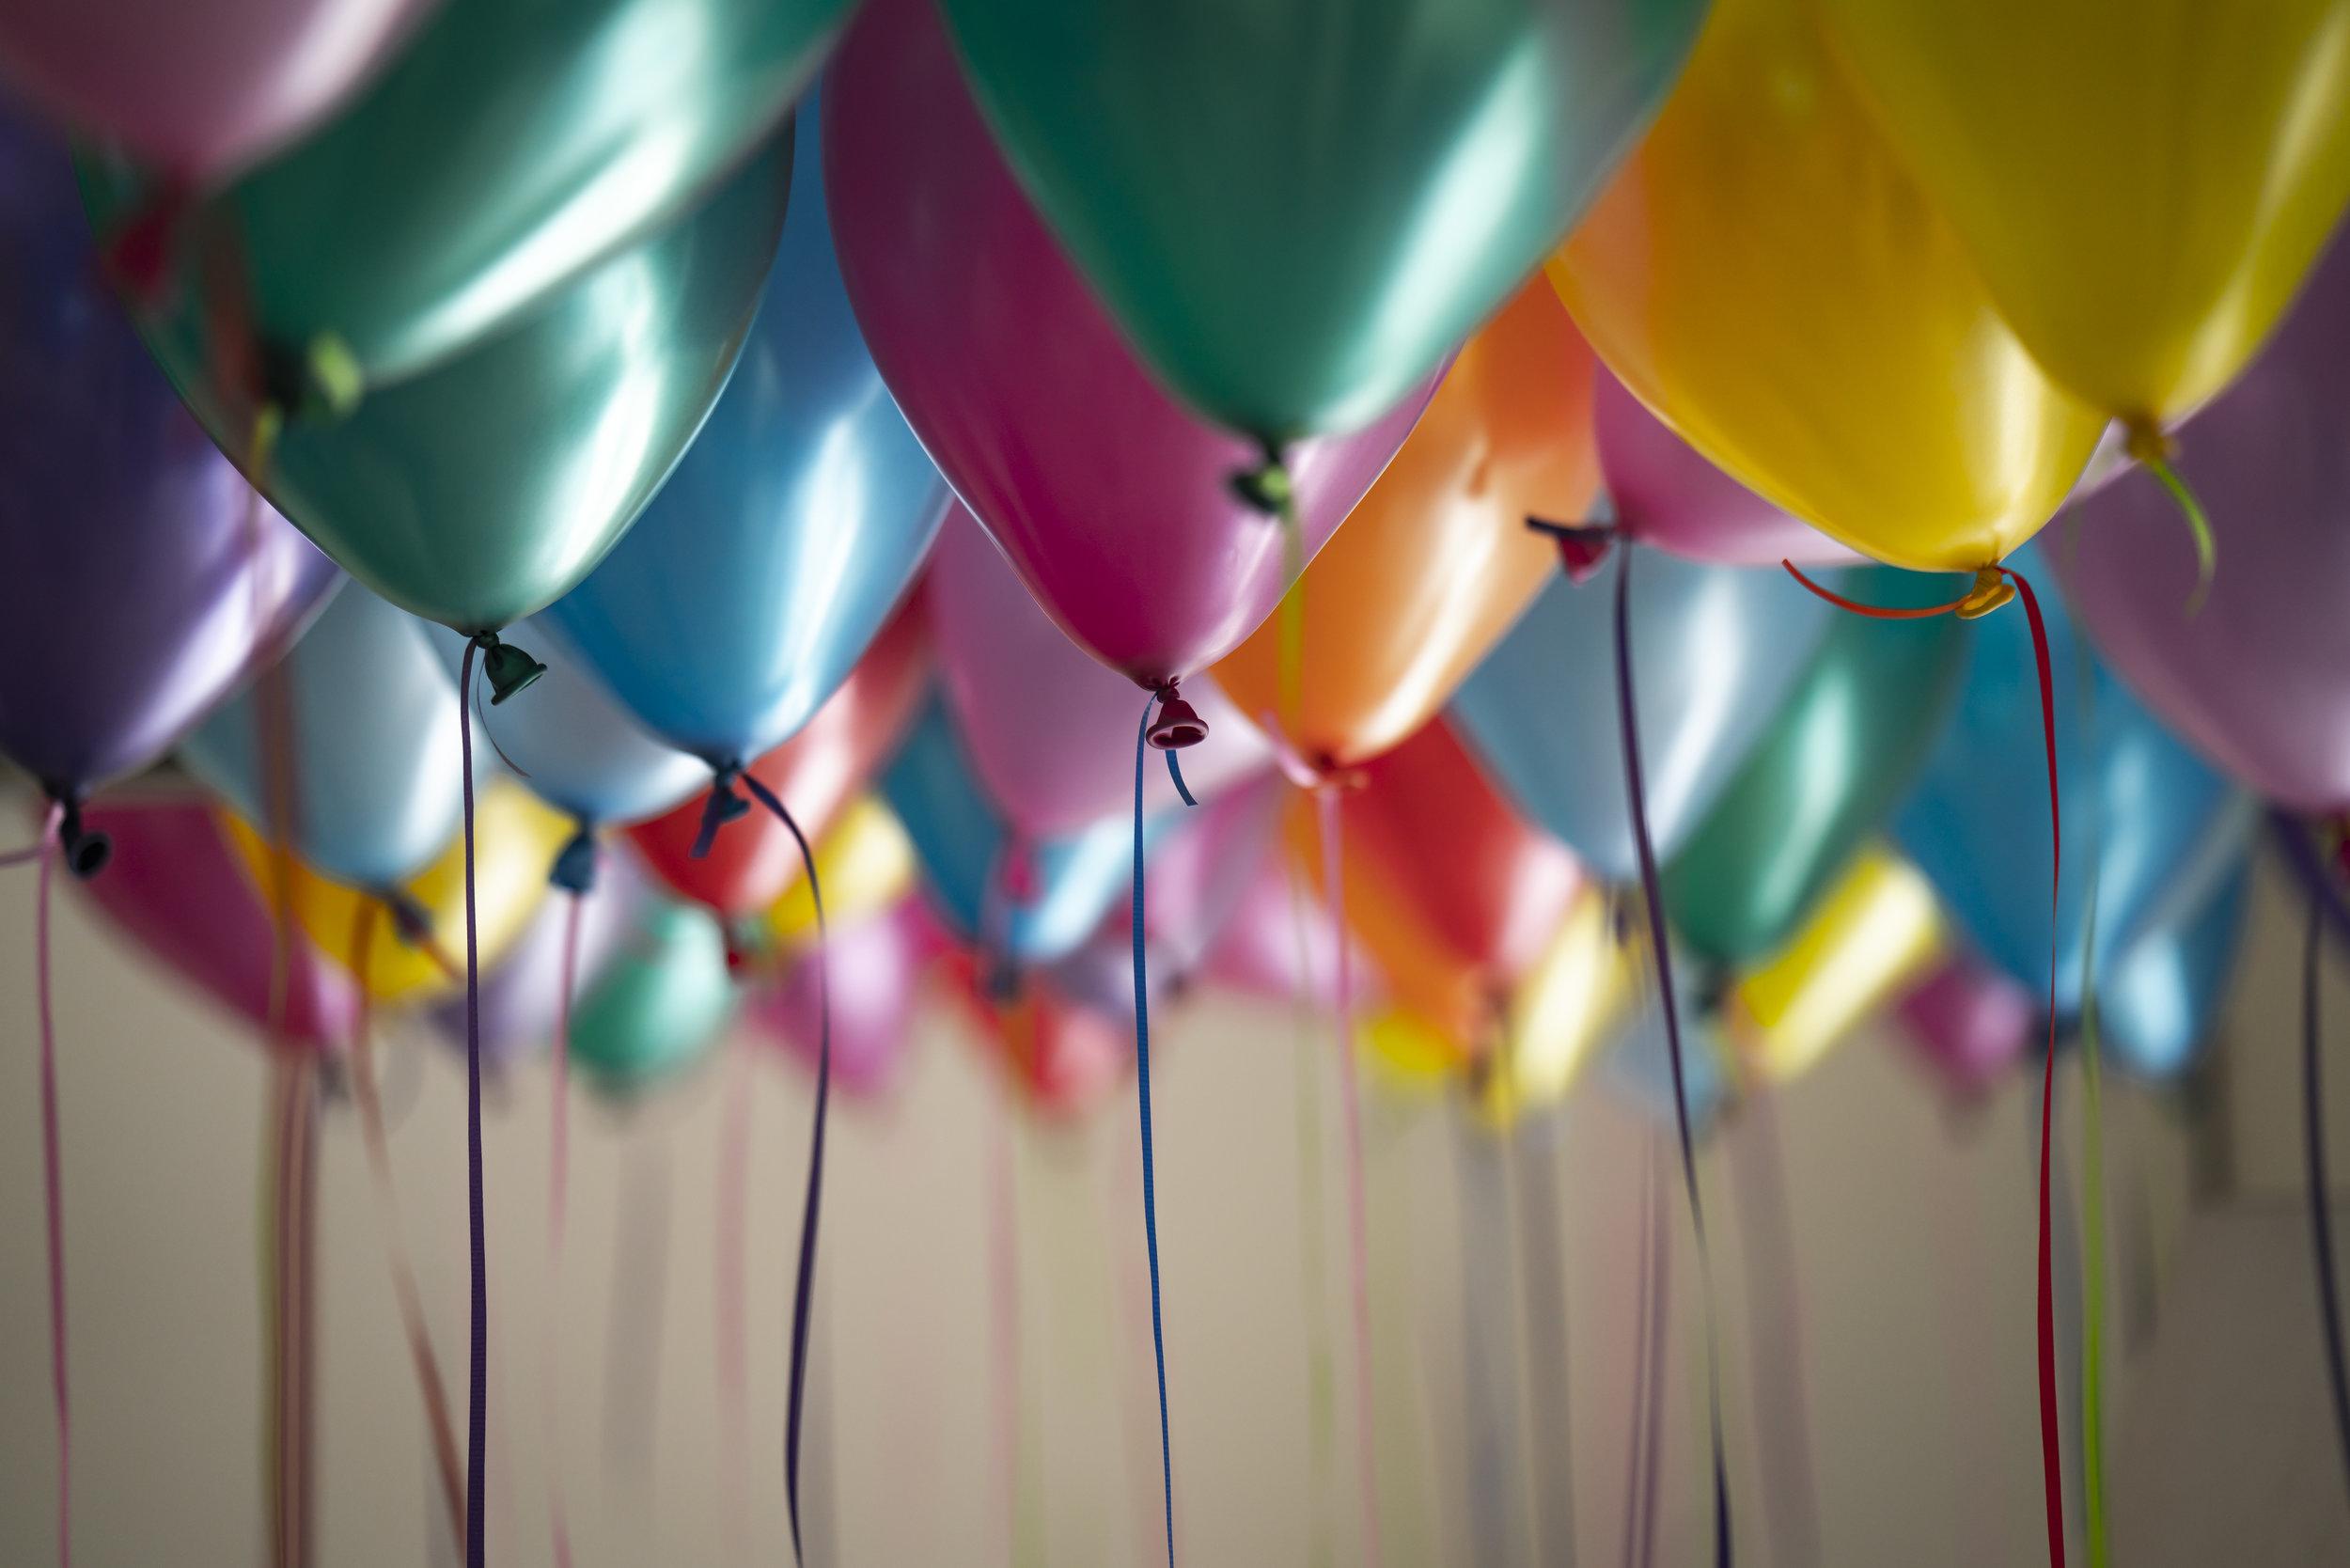 Birthday balloons by Unsplash